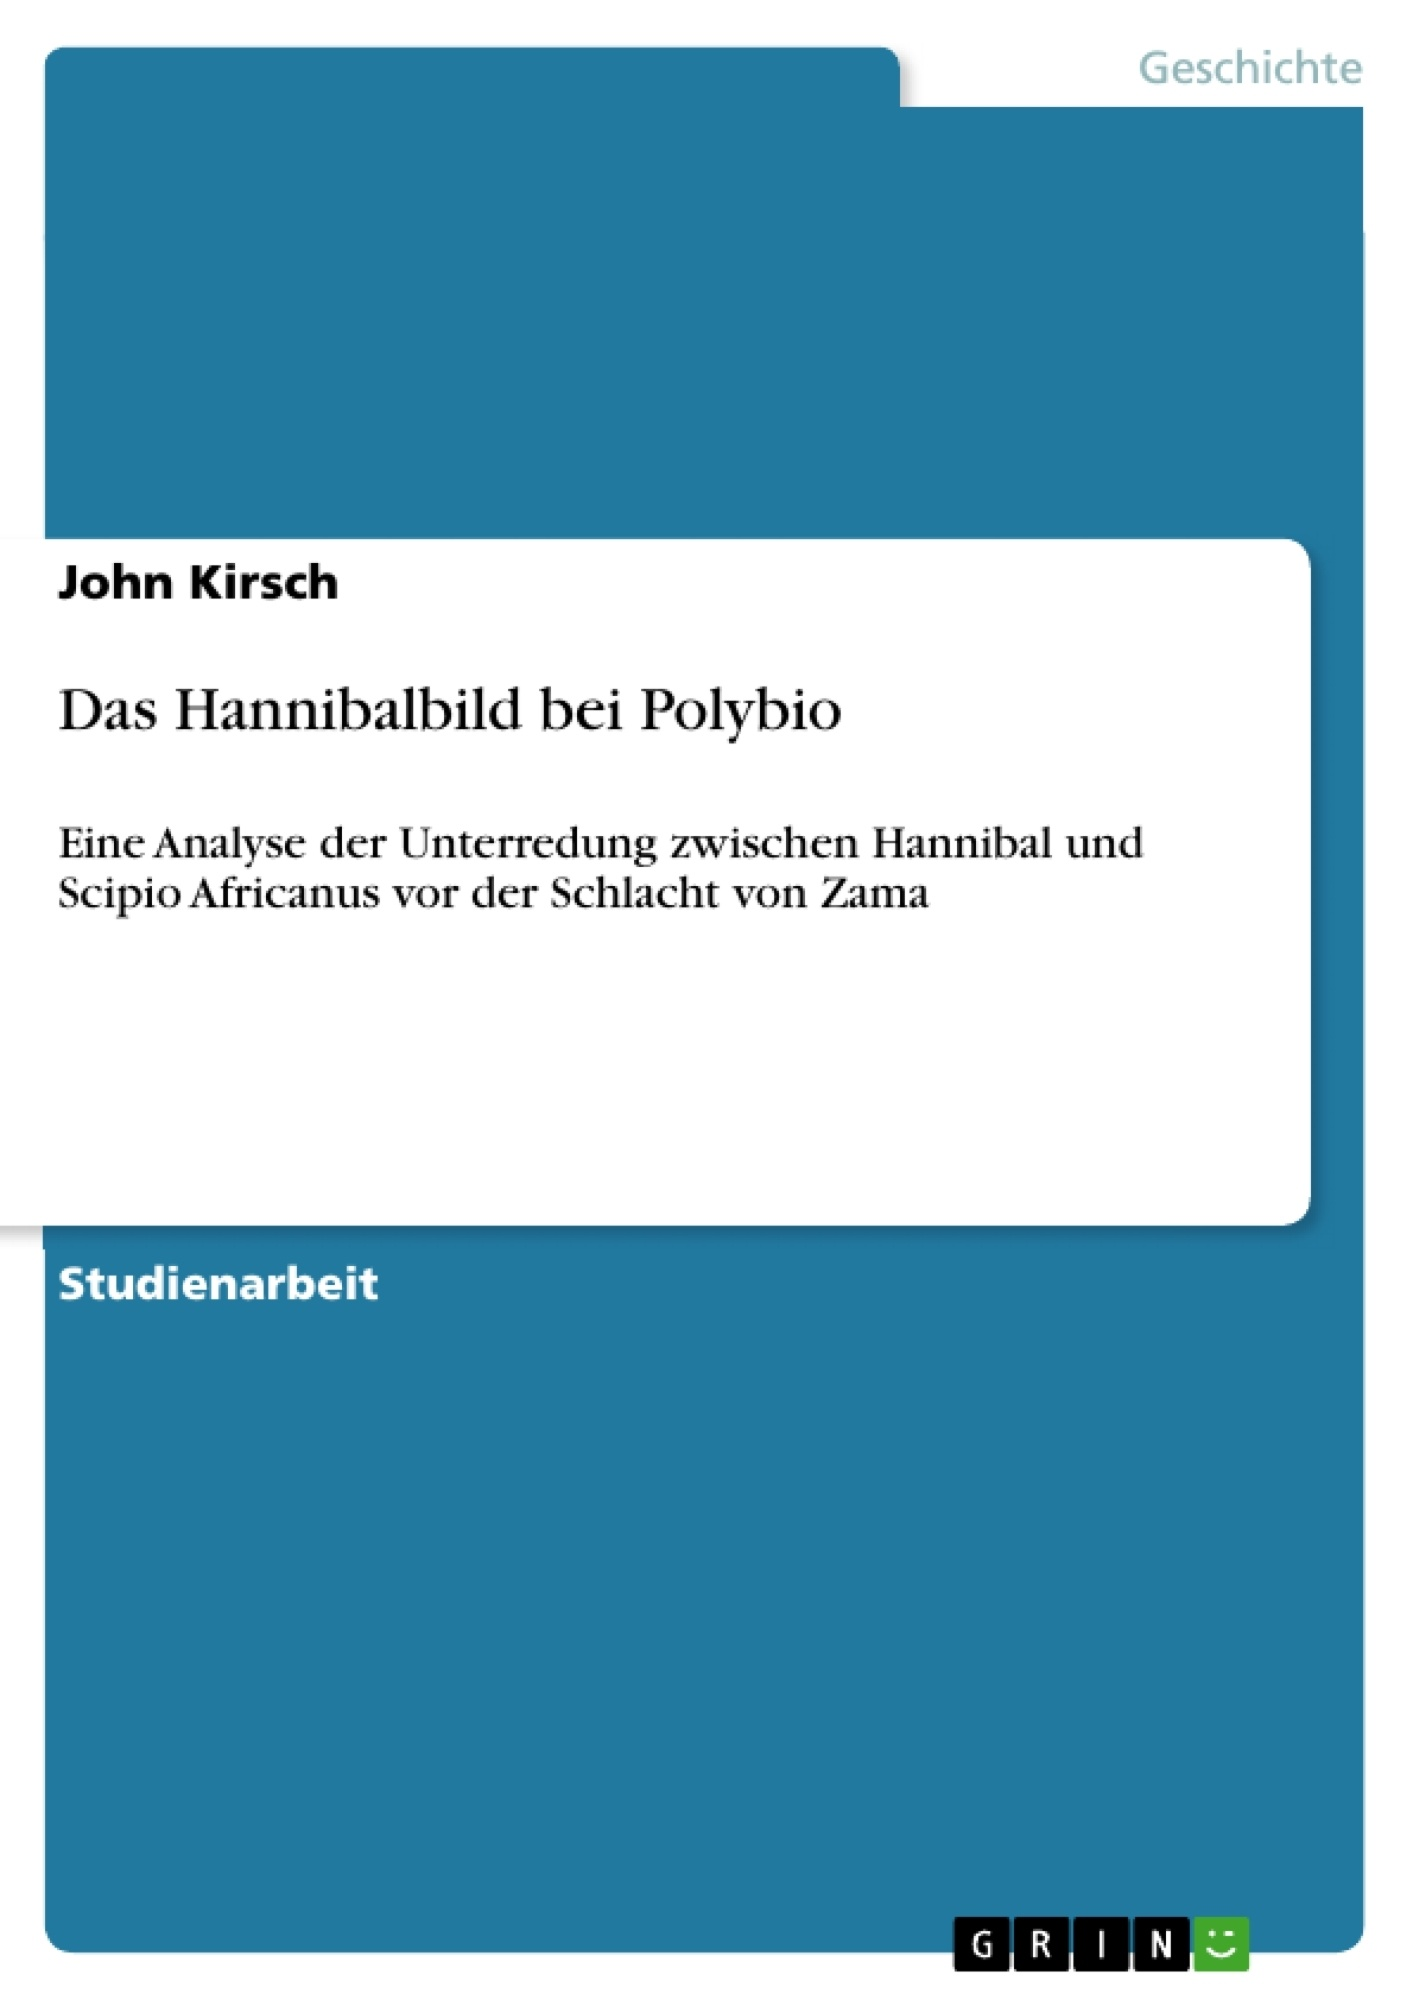 Titel: Das Hannibalbild bei Polybio